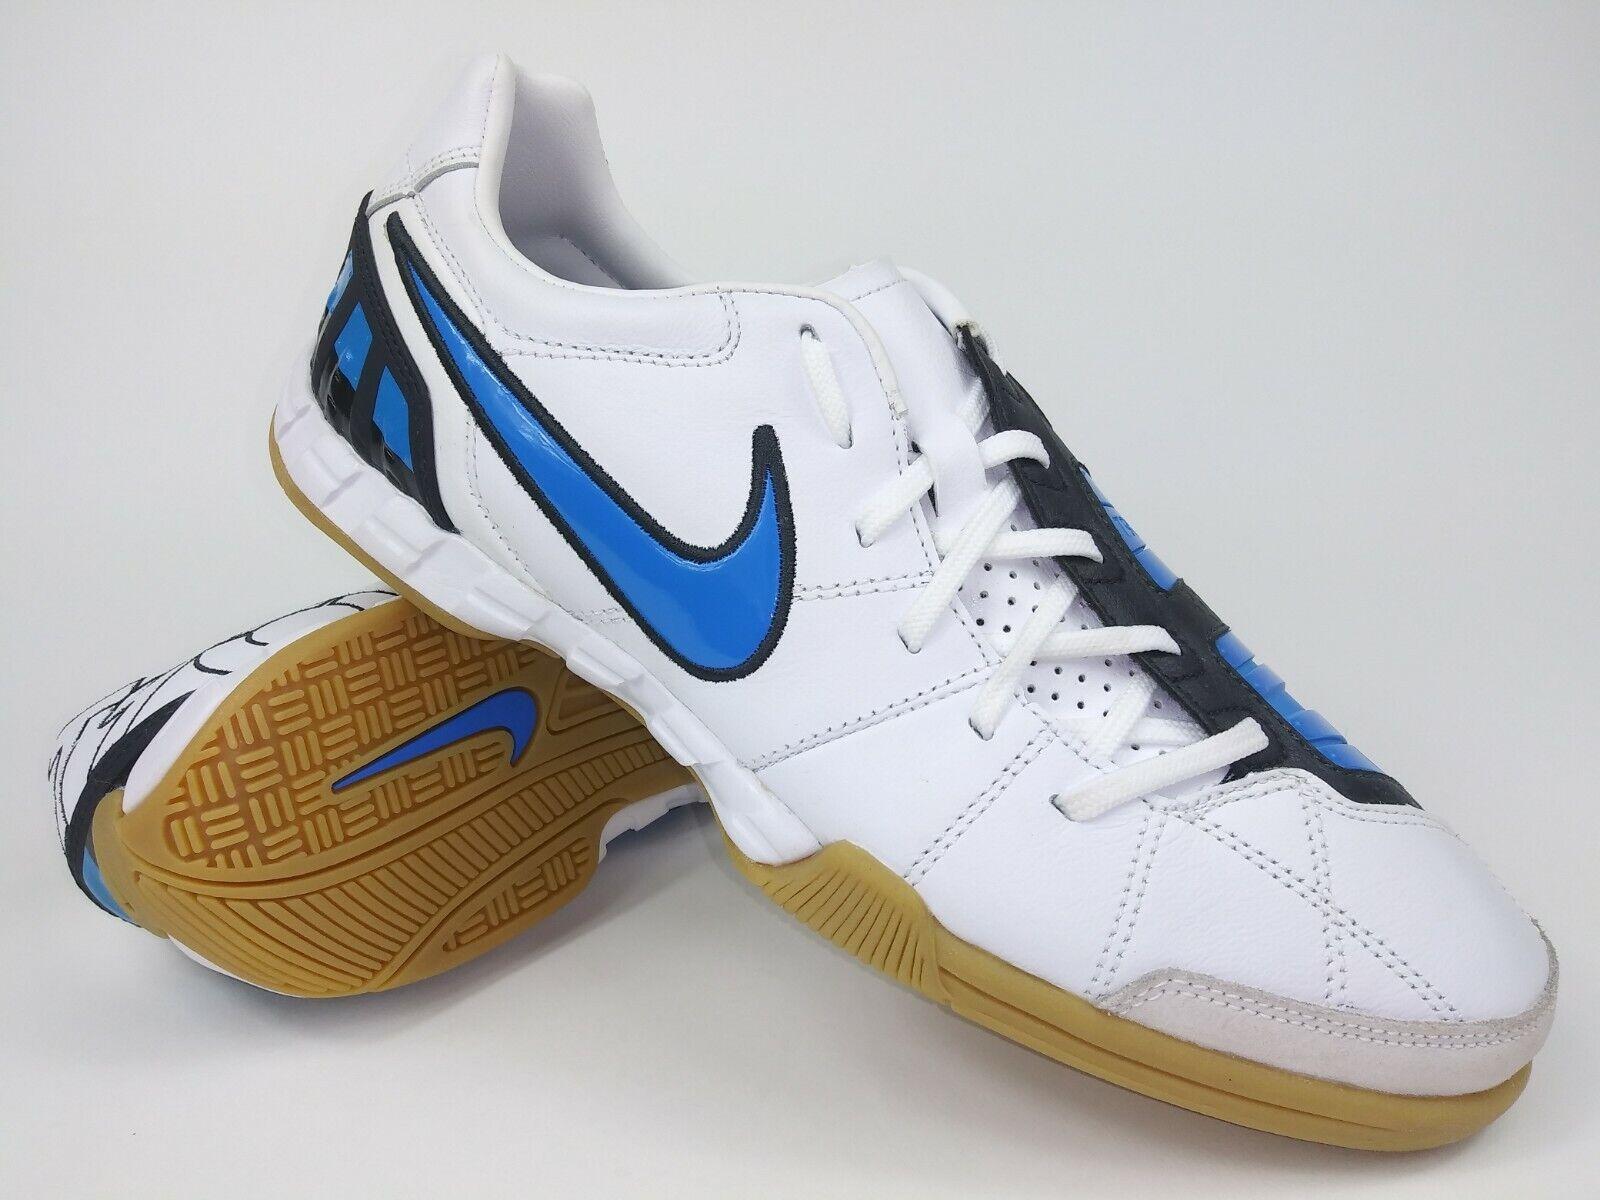 Nike Hombres Raro Total90 Shoot Lll L-IC 385437 141 Azul blancoo Fútbol Indoor